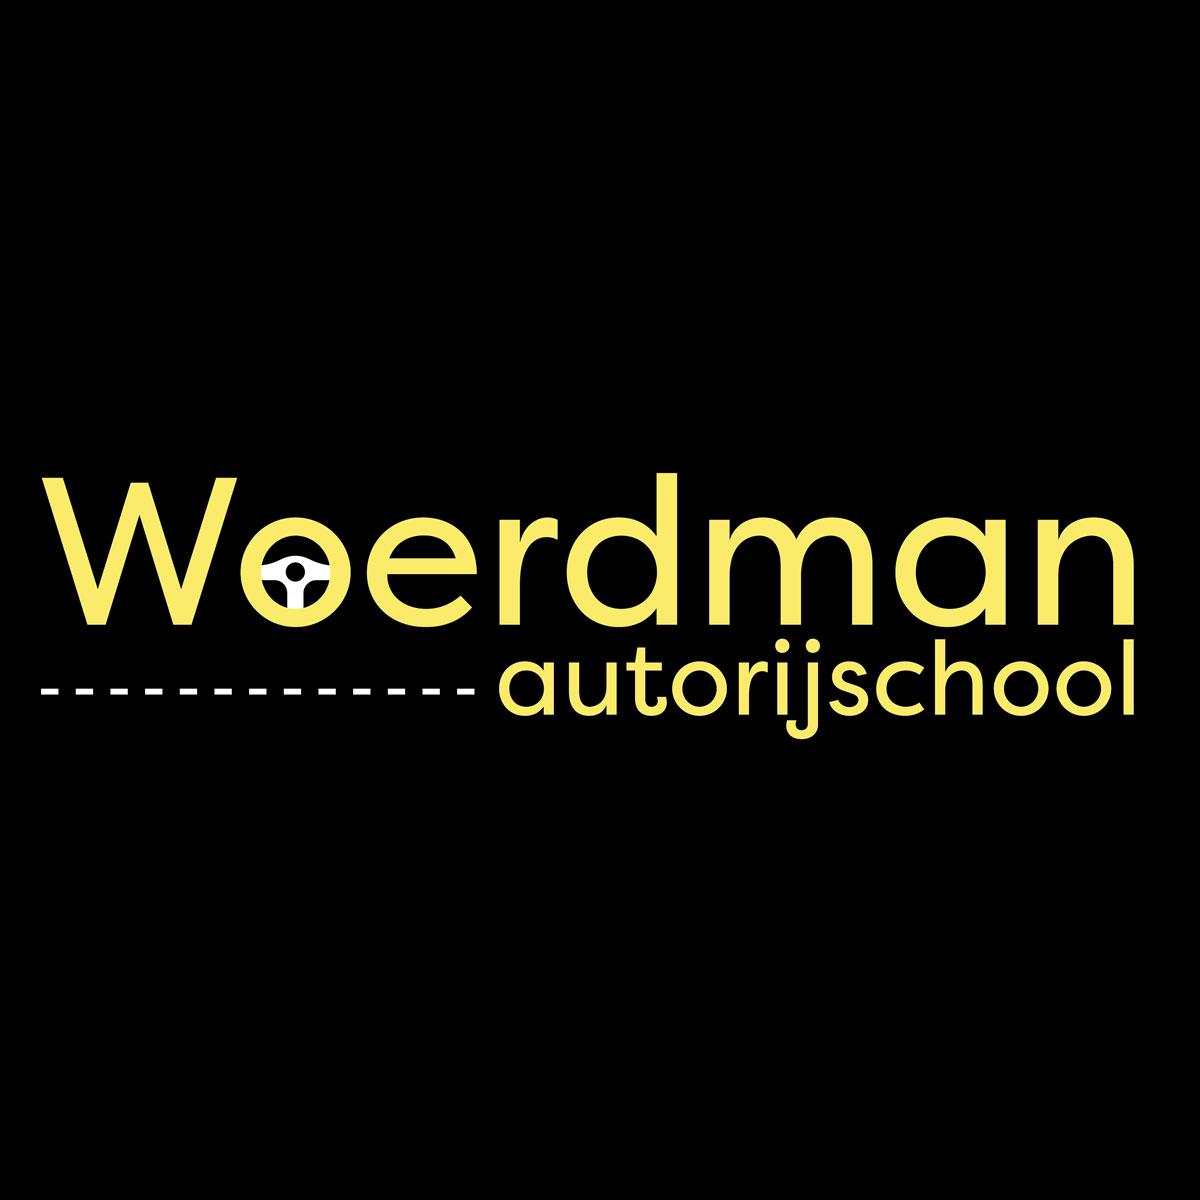 Woerdman autorijschool